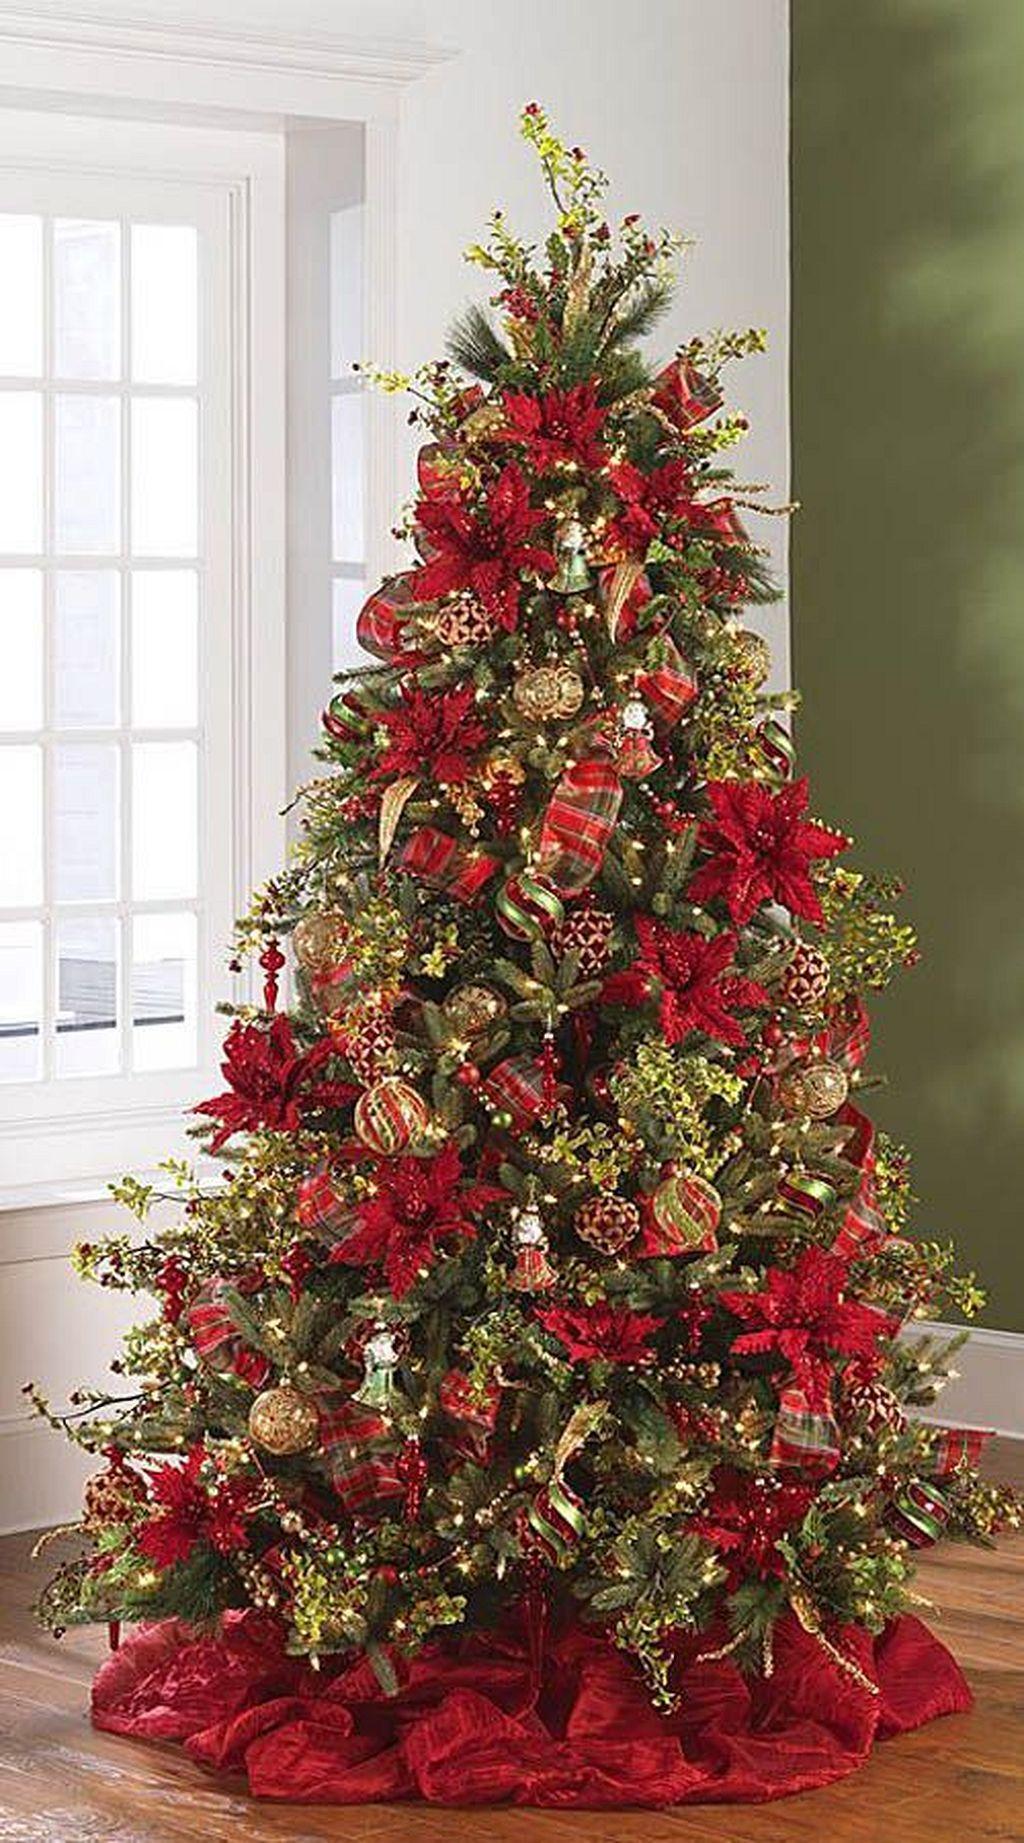 37 Christmas Tree Decoration Ideas Christmas tree themes